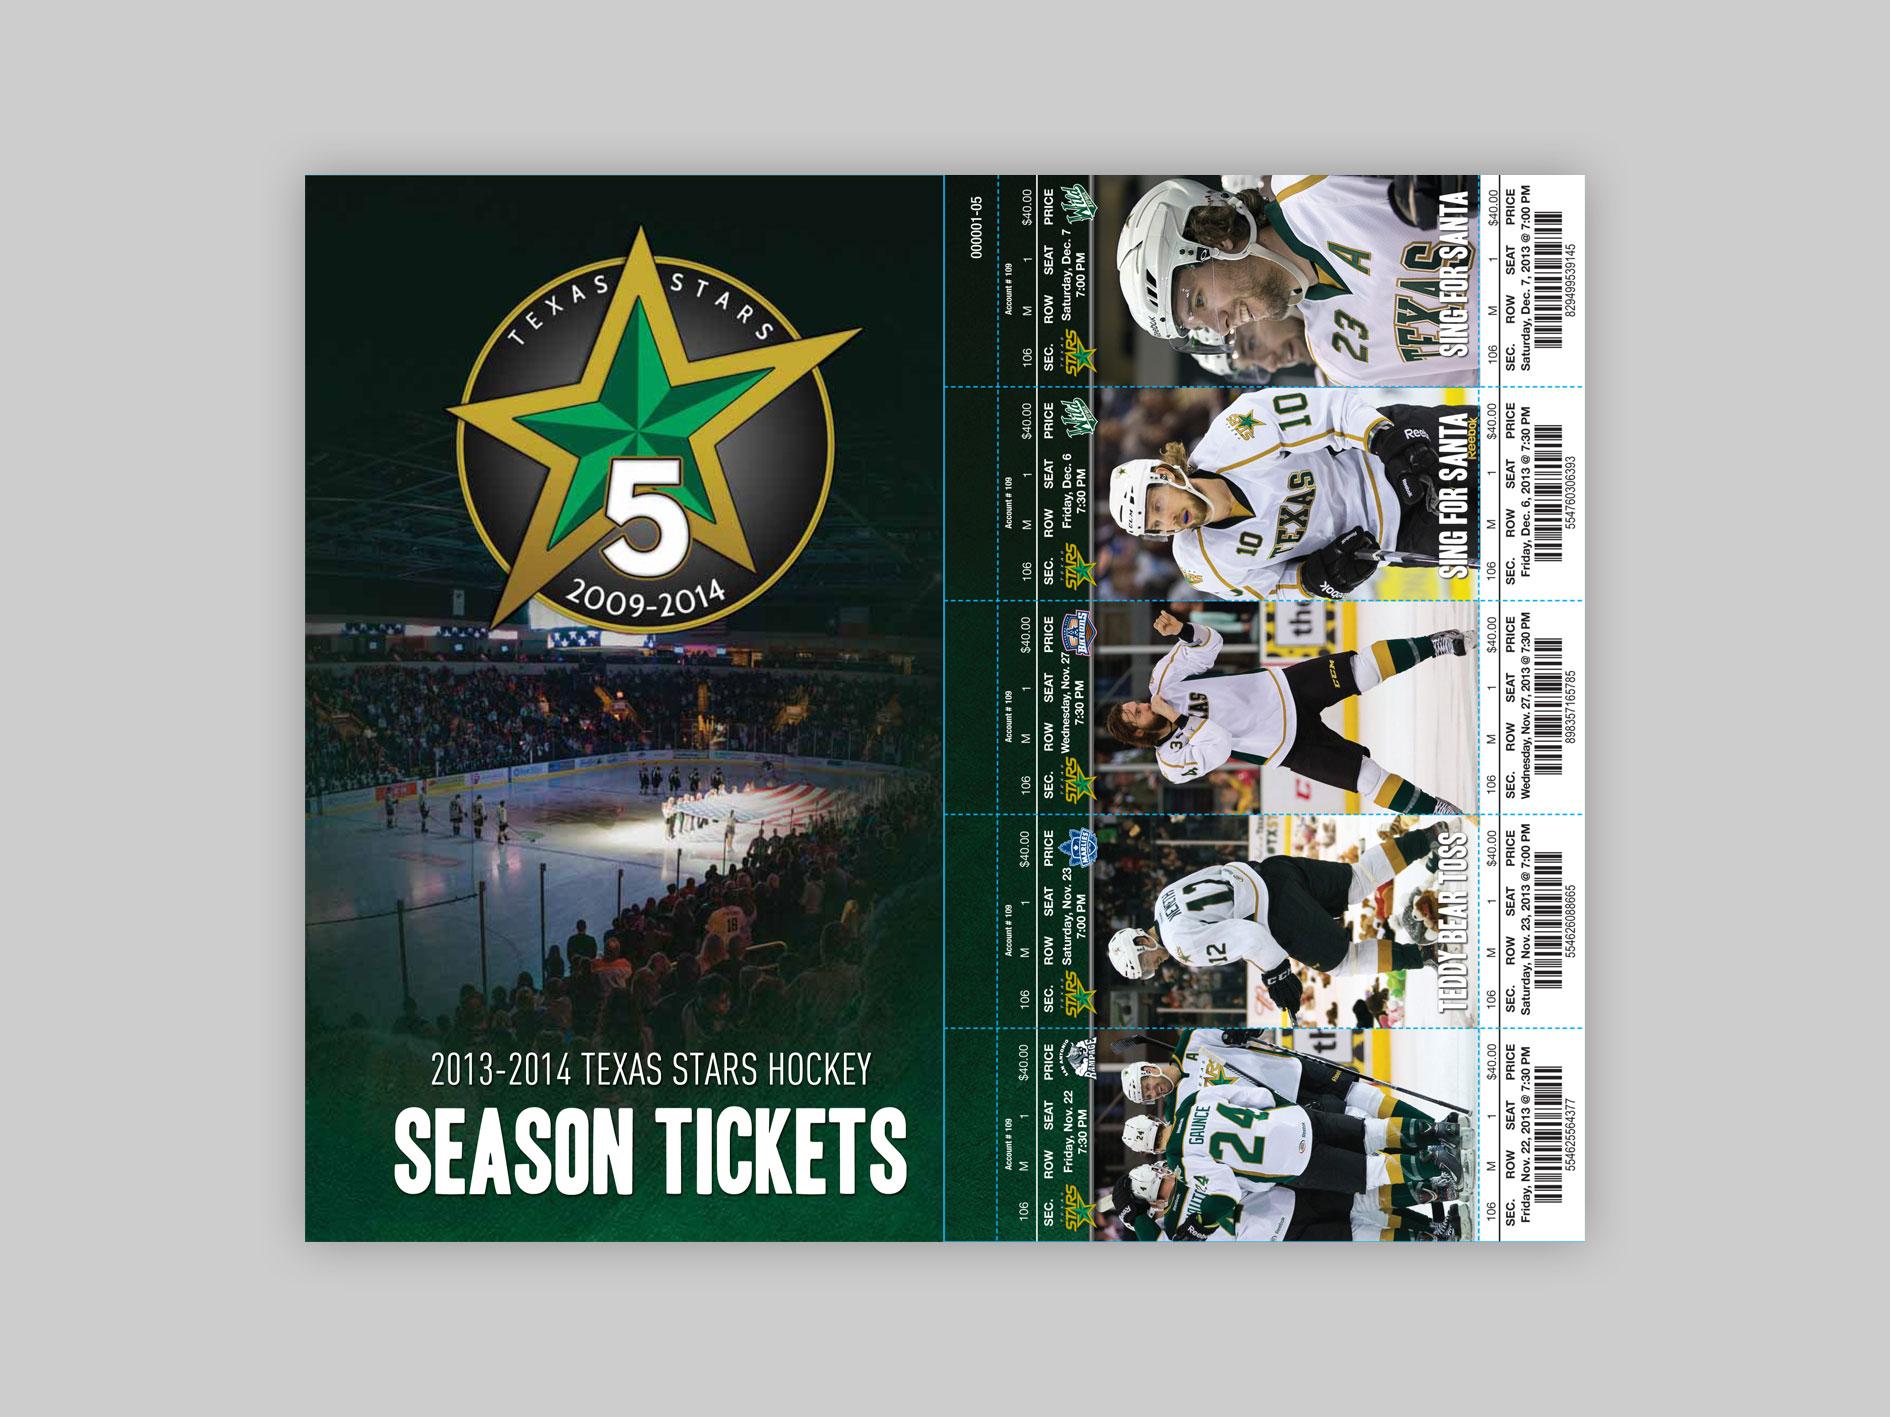 Printed ticket book, provided to Season Ticket Holders each season.